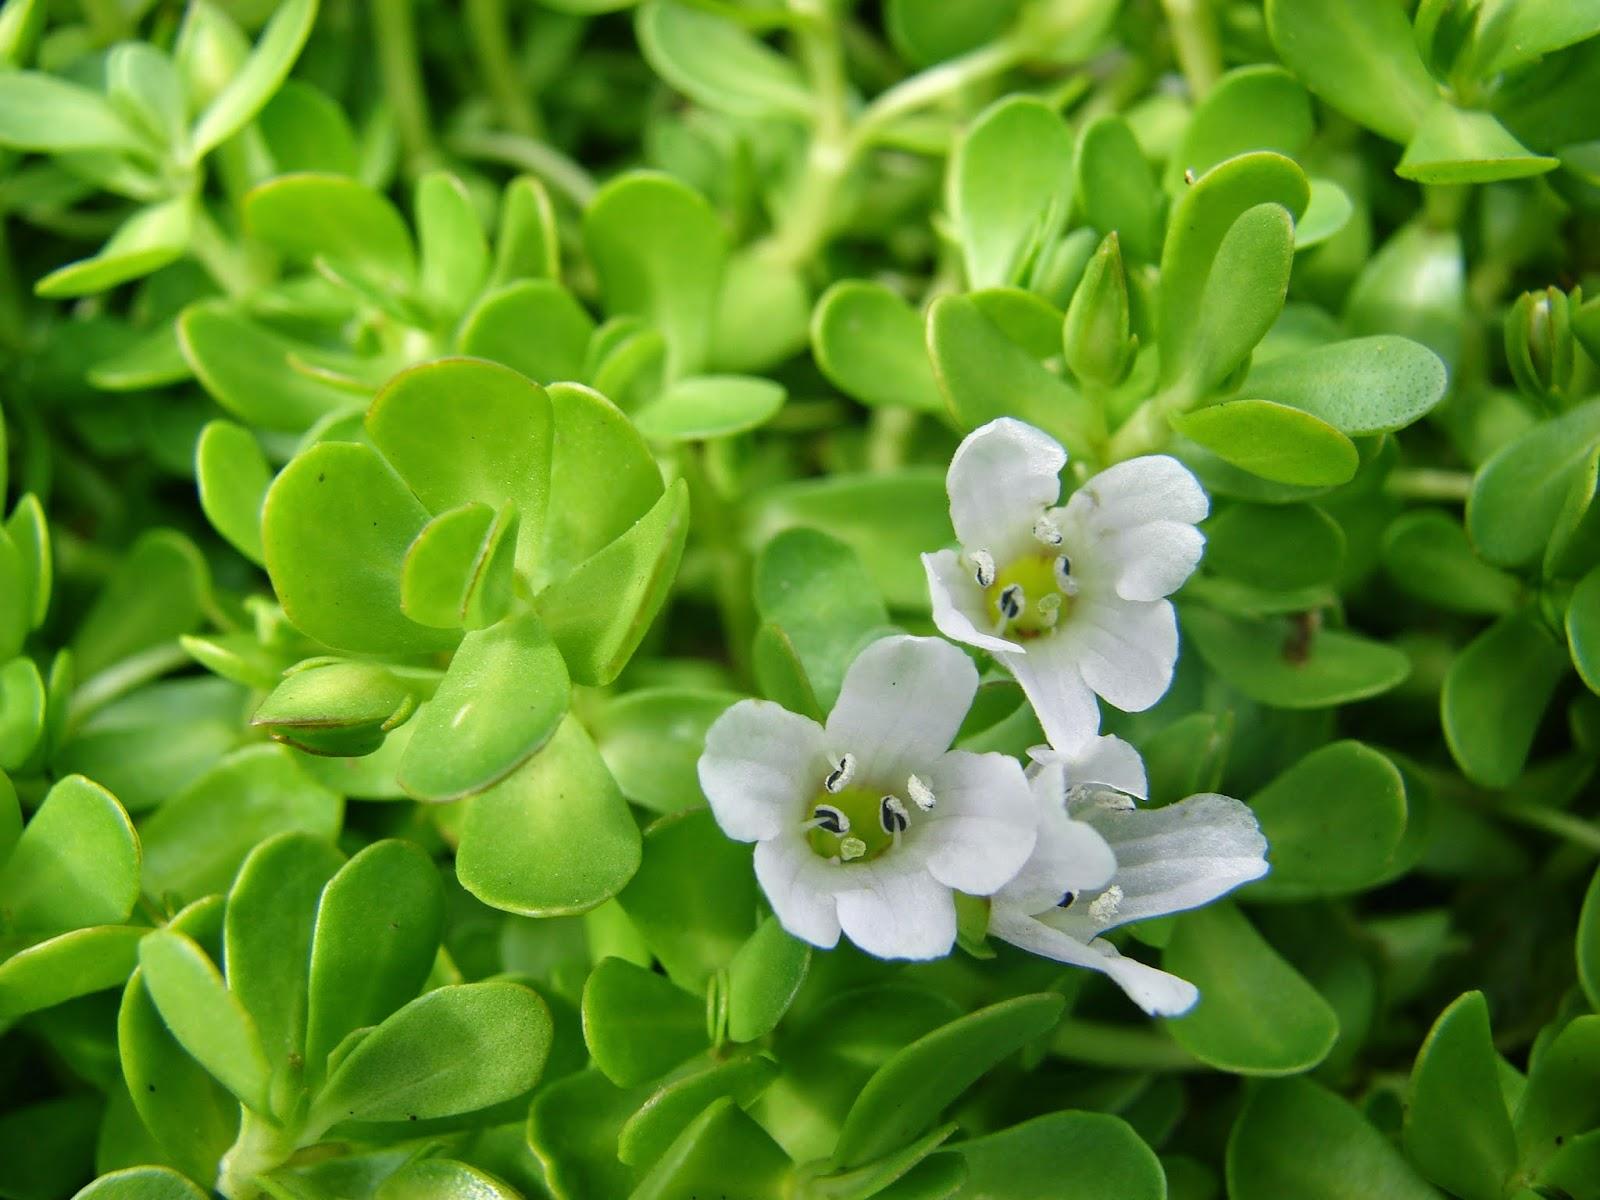 edible water plants